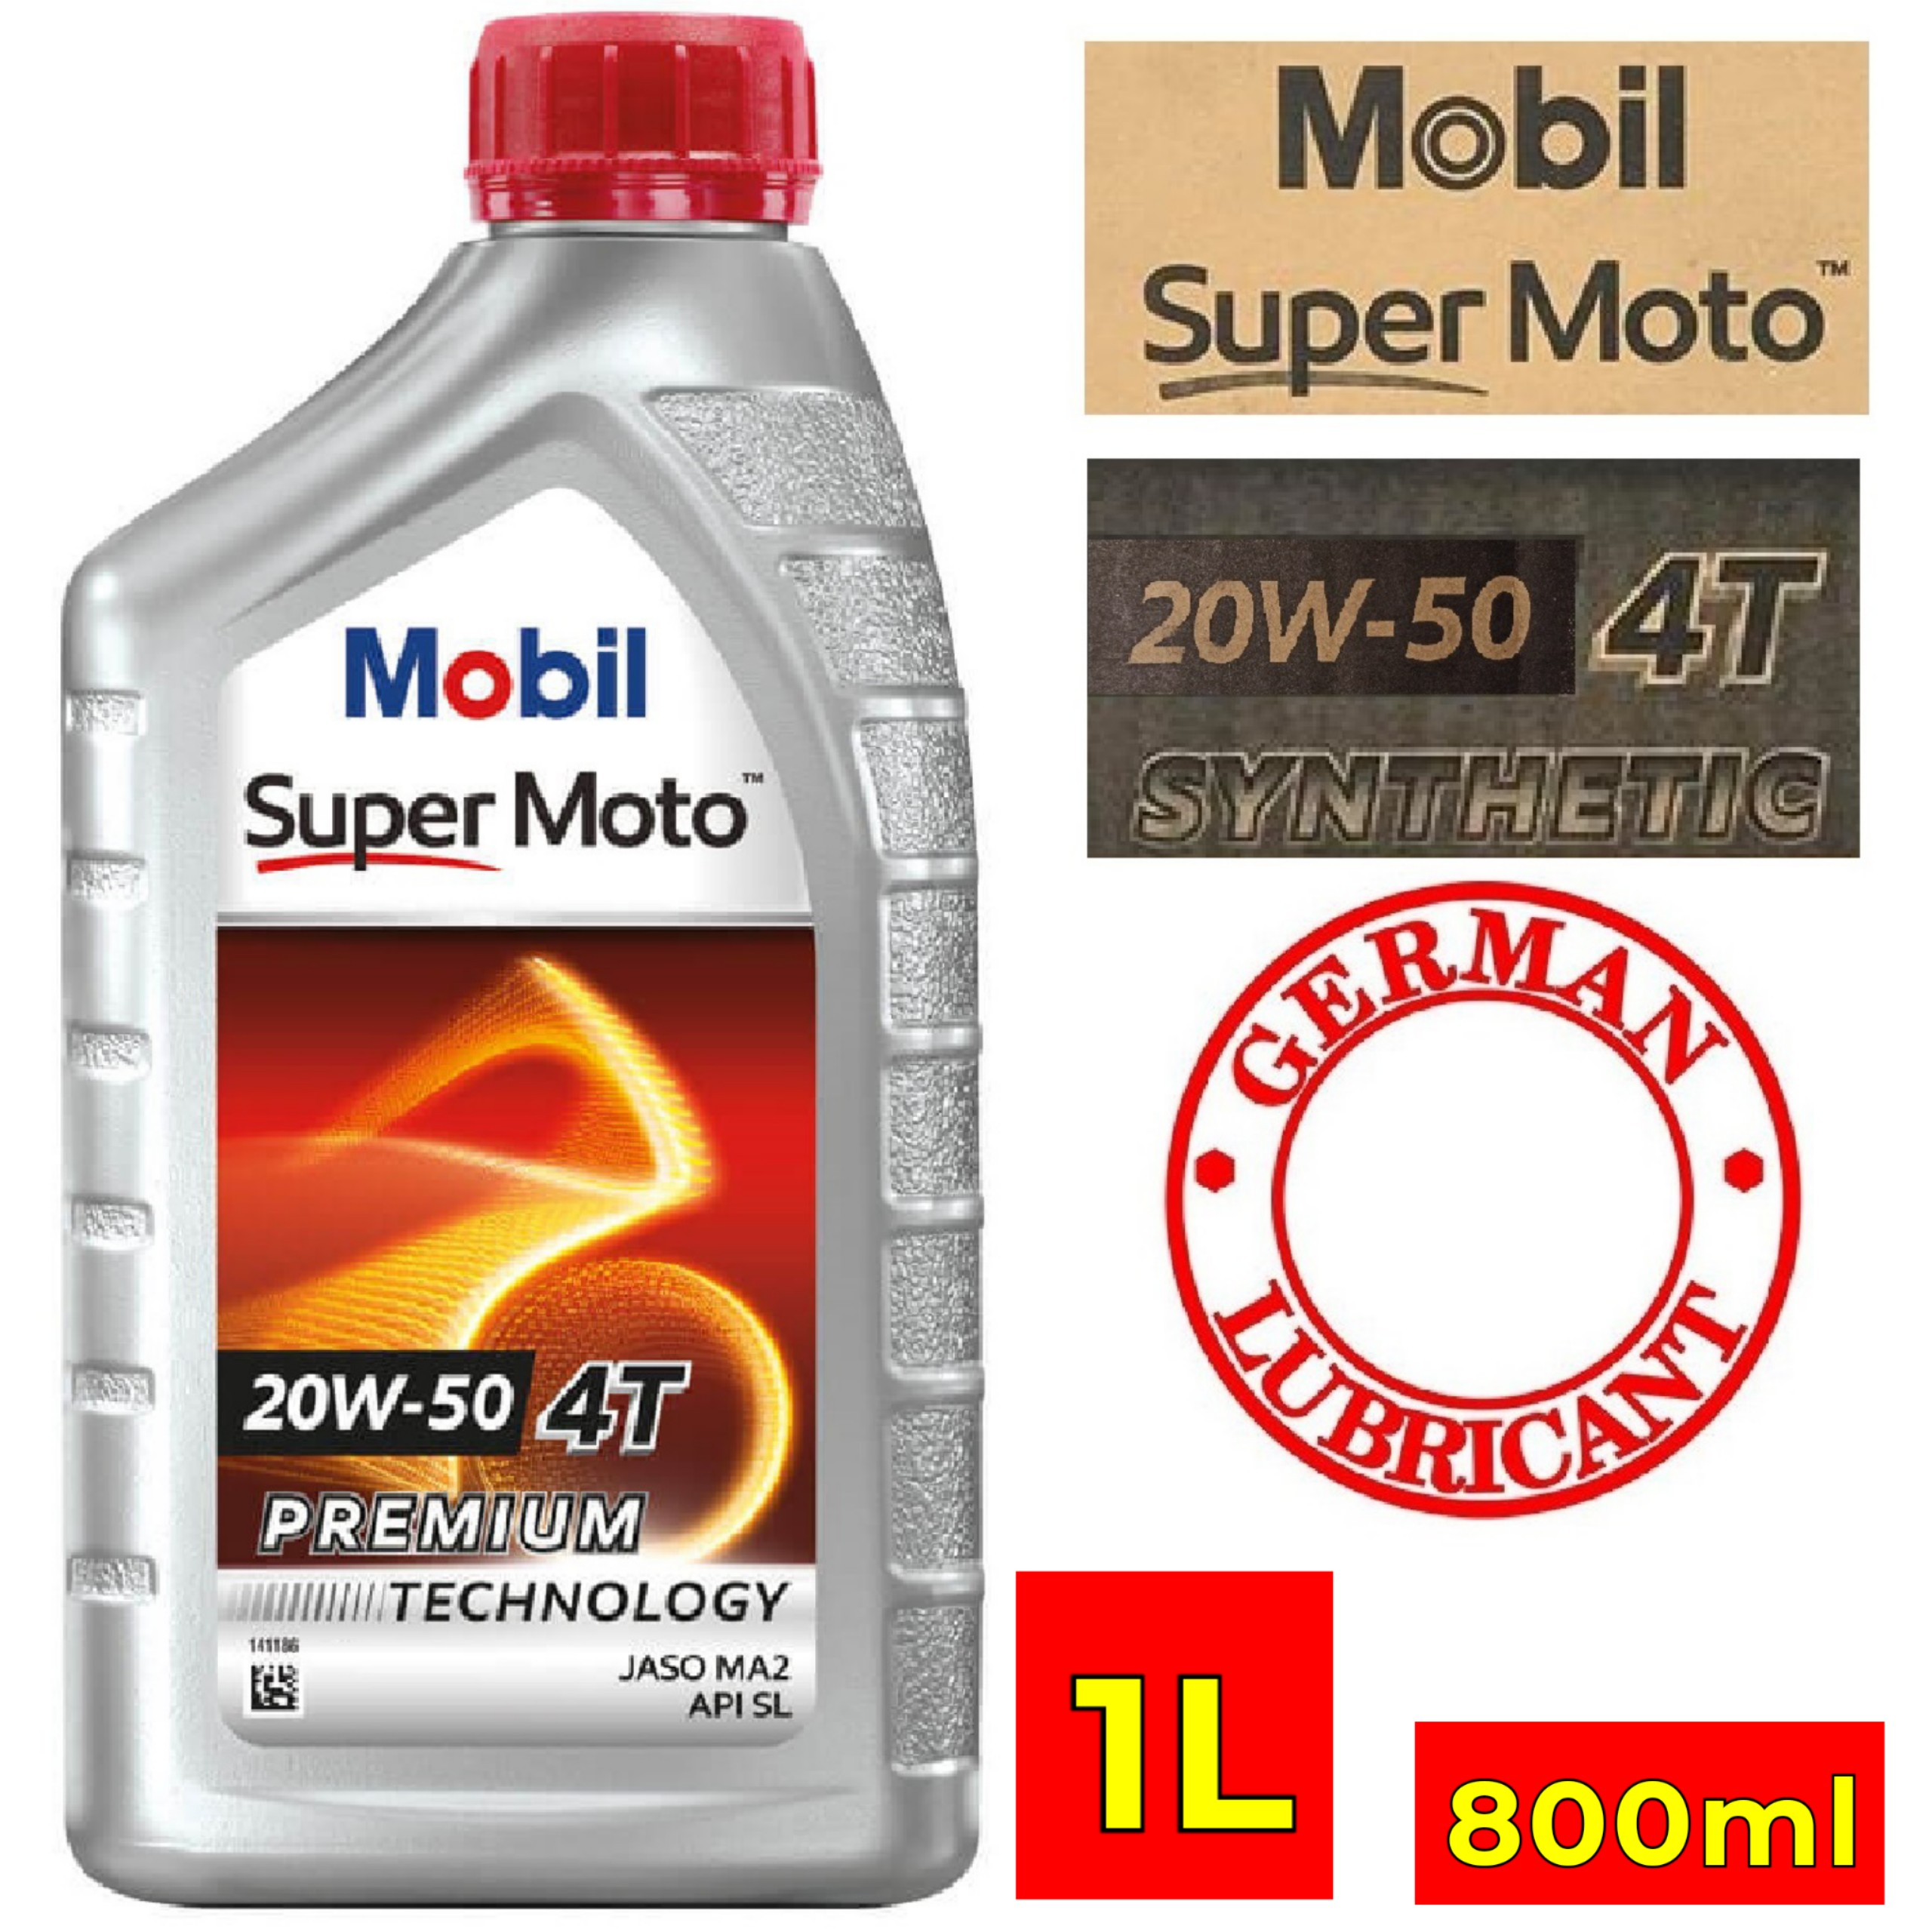 [HCM]Dầu nhớt Mobil Super Moto 20w50 (chai) German Lubricant 800mL - 1L